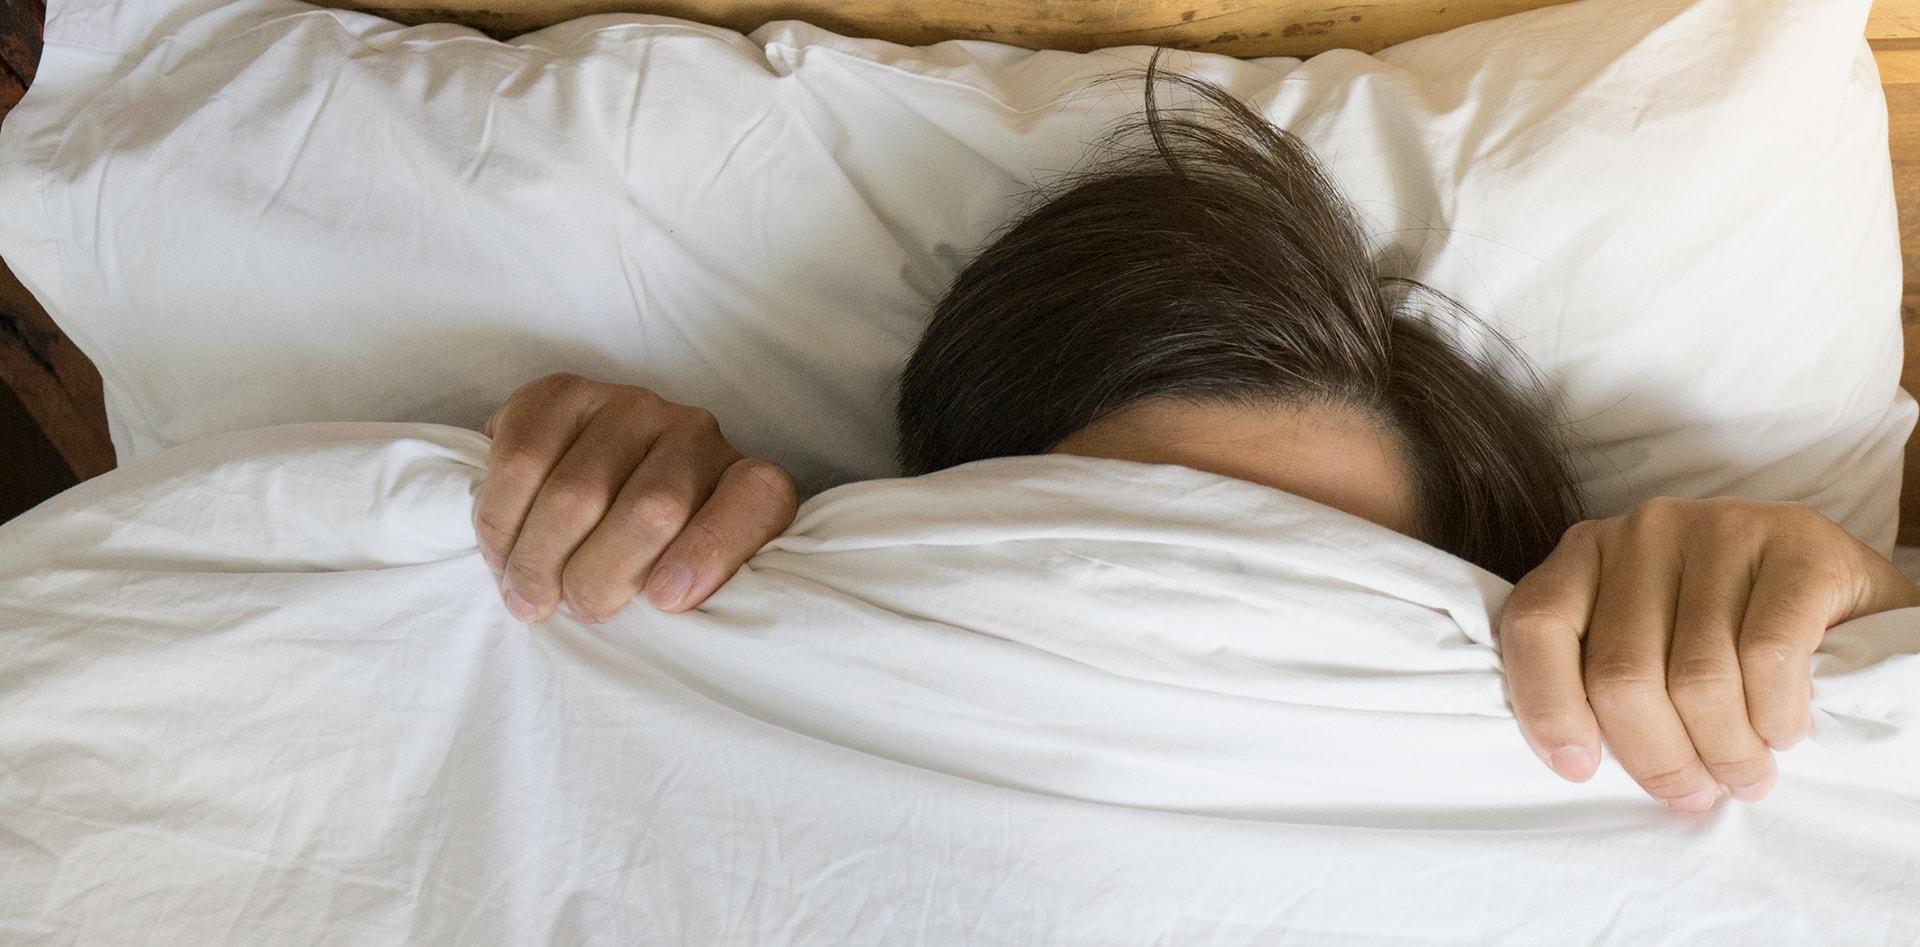 Cura Attacchi di Panico Notturni